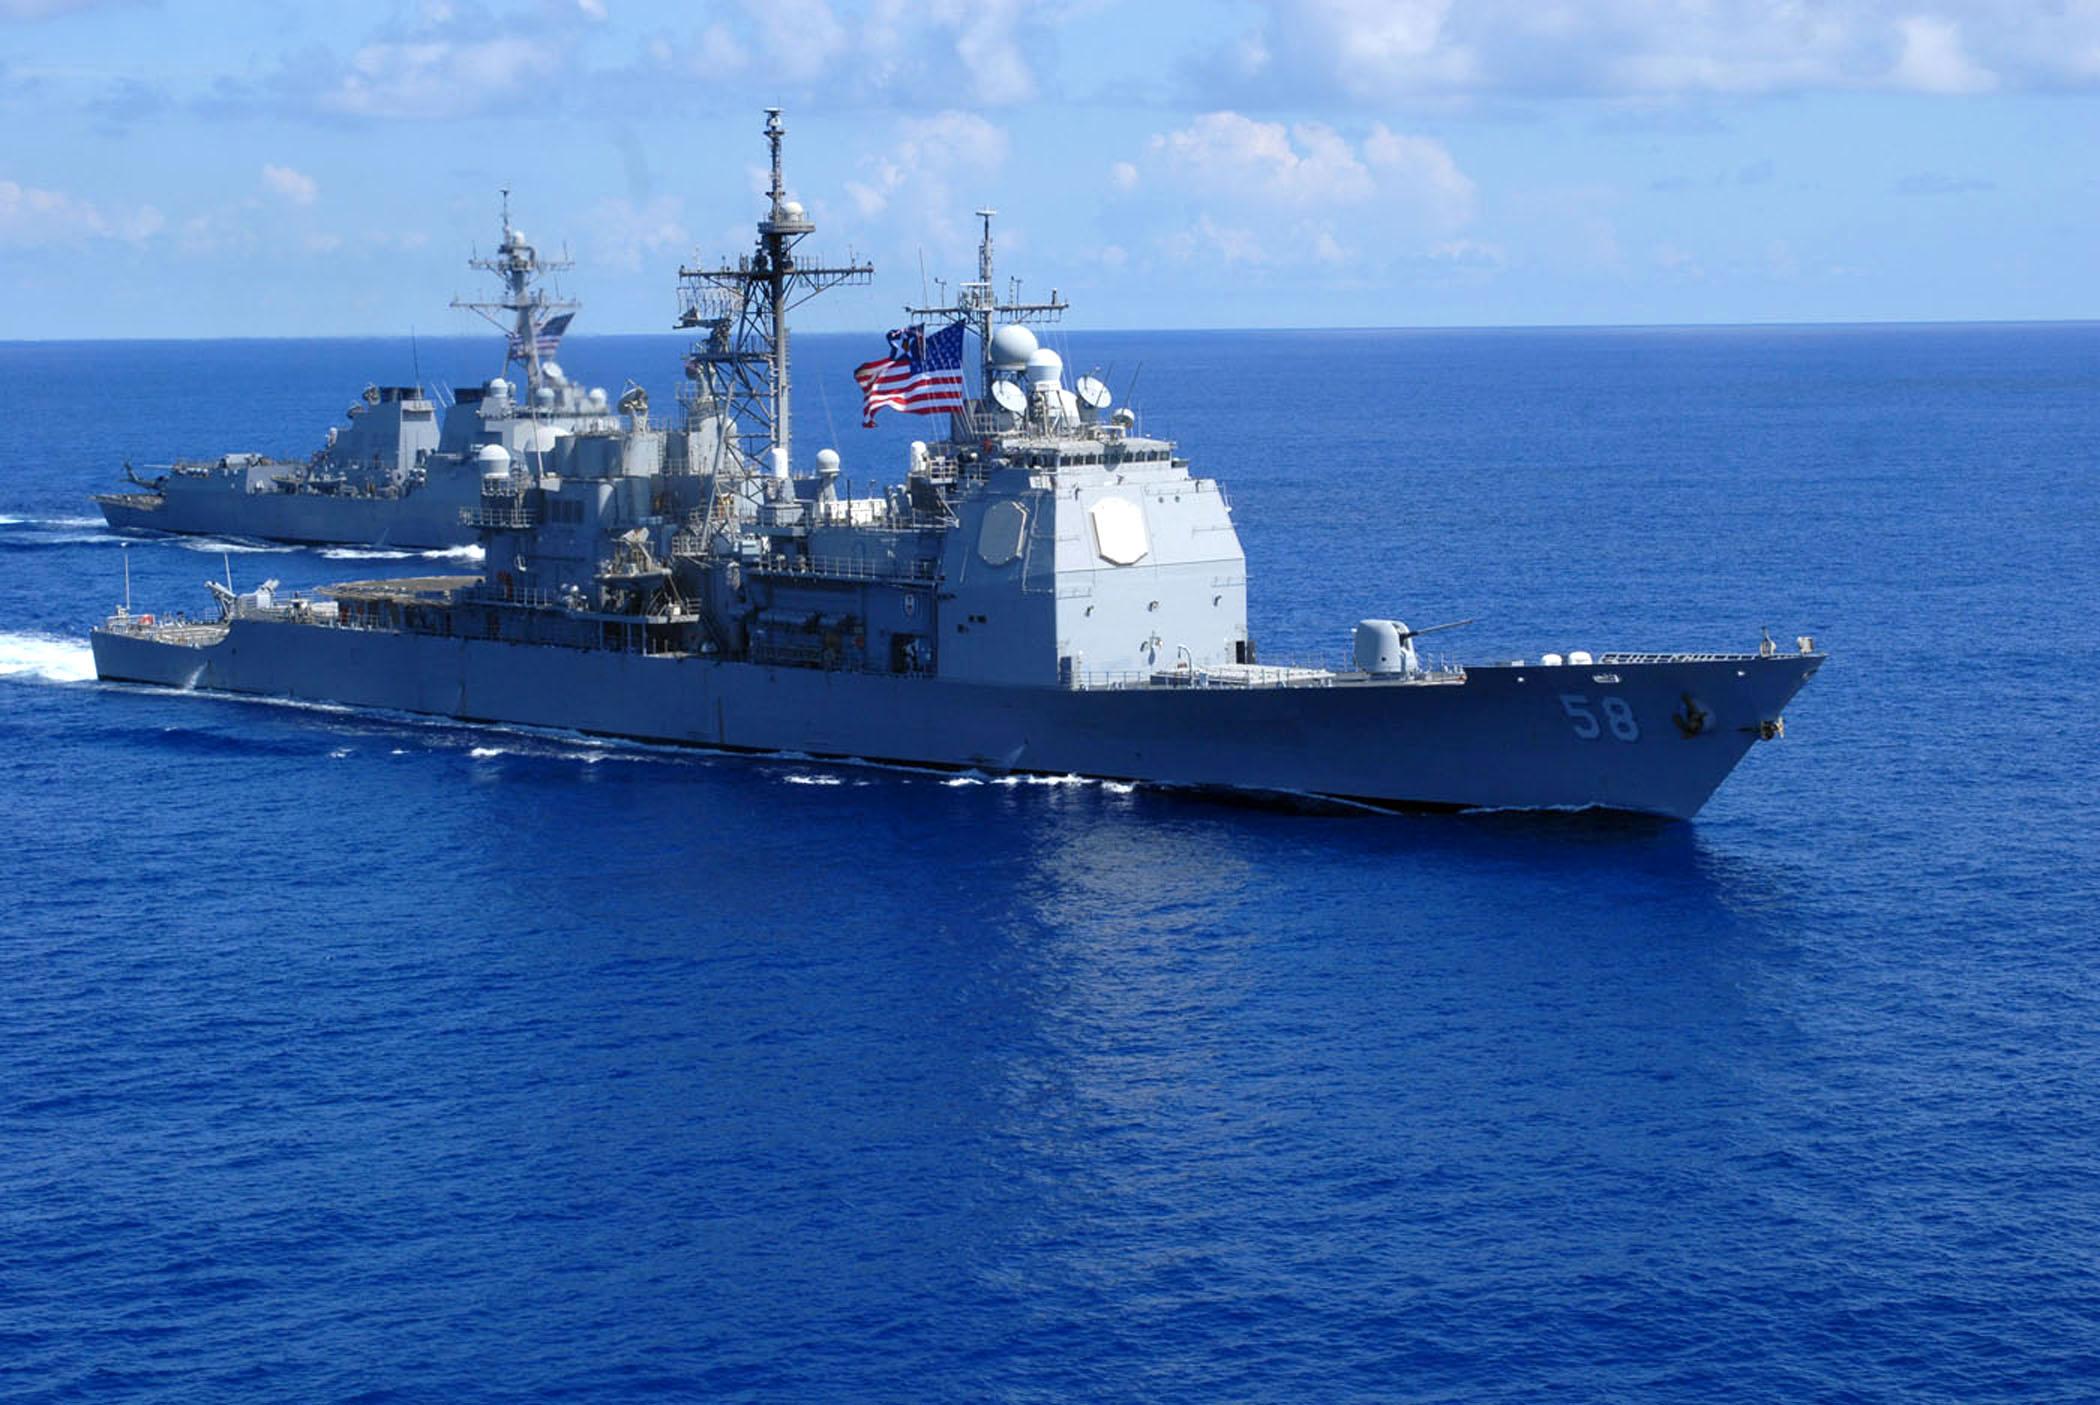 USS CG 58 da USN lança míssil Tomahawk contra alvos islâmicos na Síria